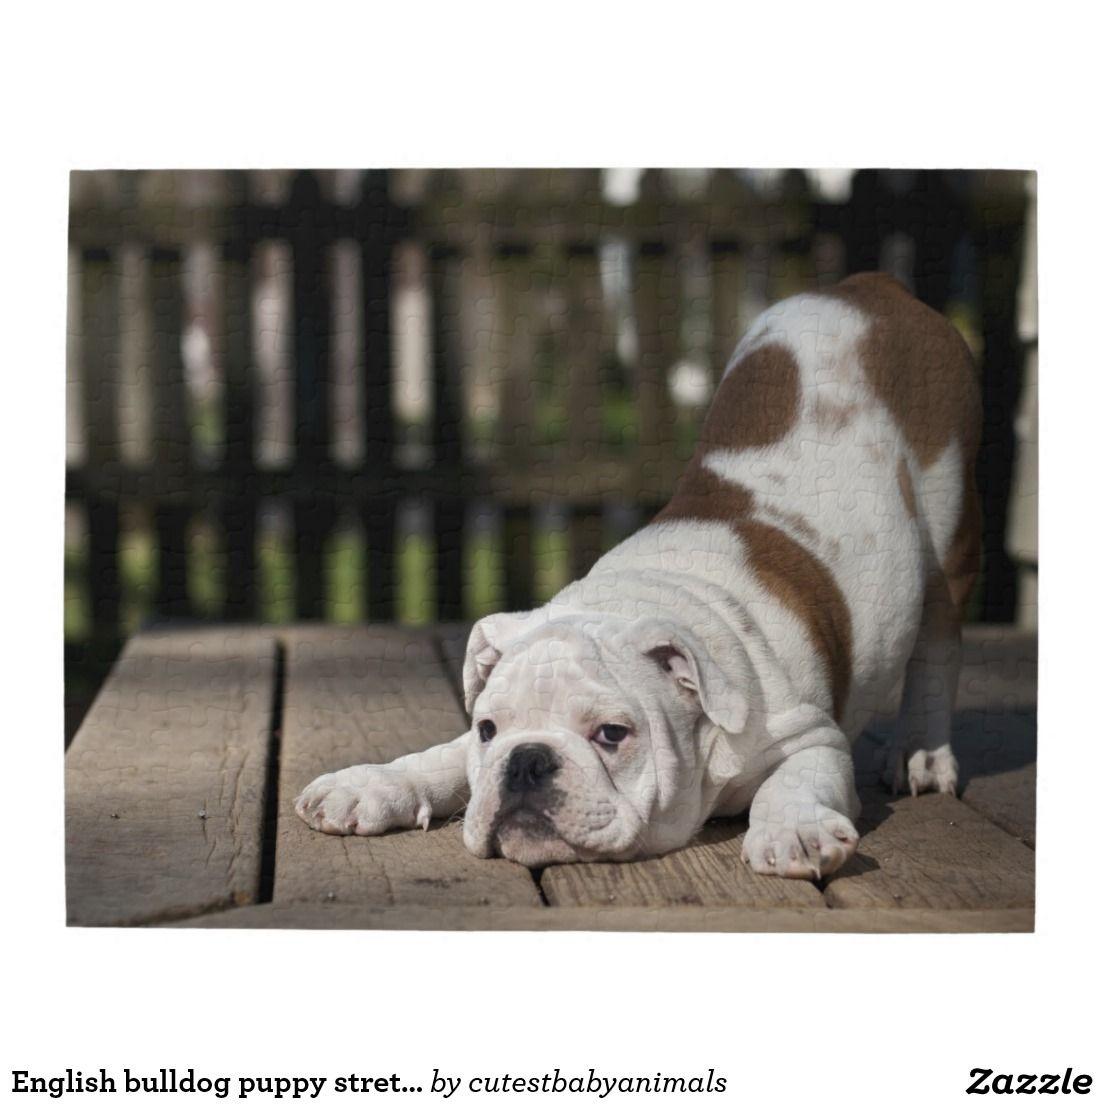 English Bulldog Puppy Jigsaw Puzzle Zazzle Com In 2020 Puppy Breeds Bulldog Bulldog Breeds